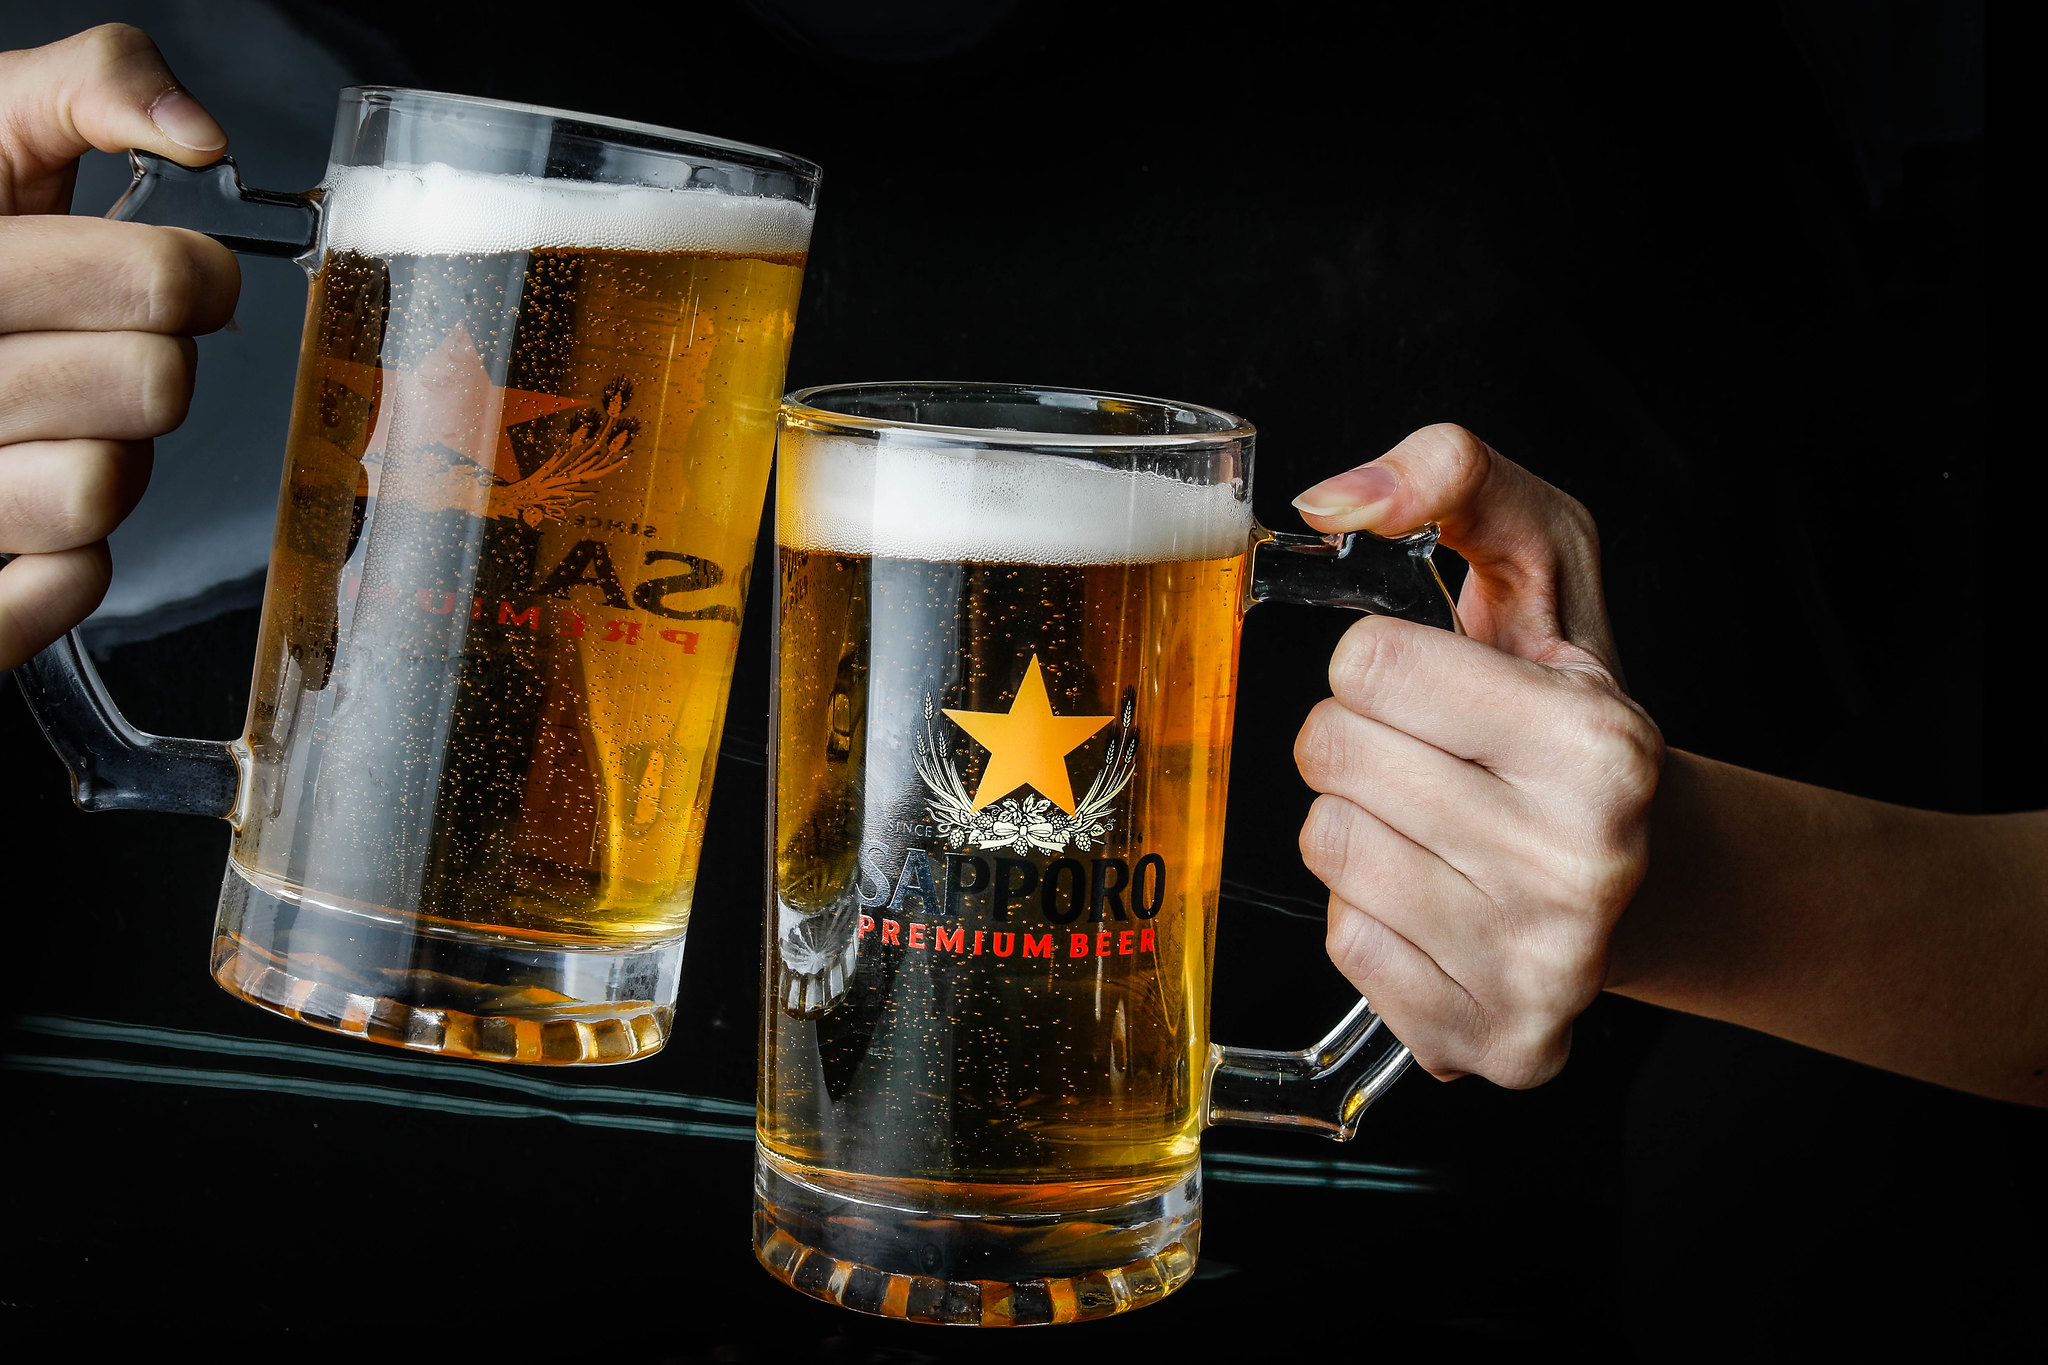 Sapporo Premium Beer cups